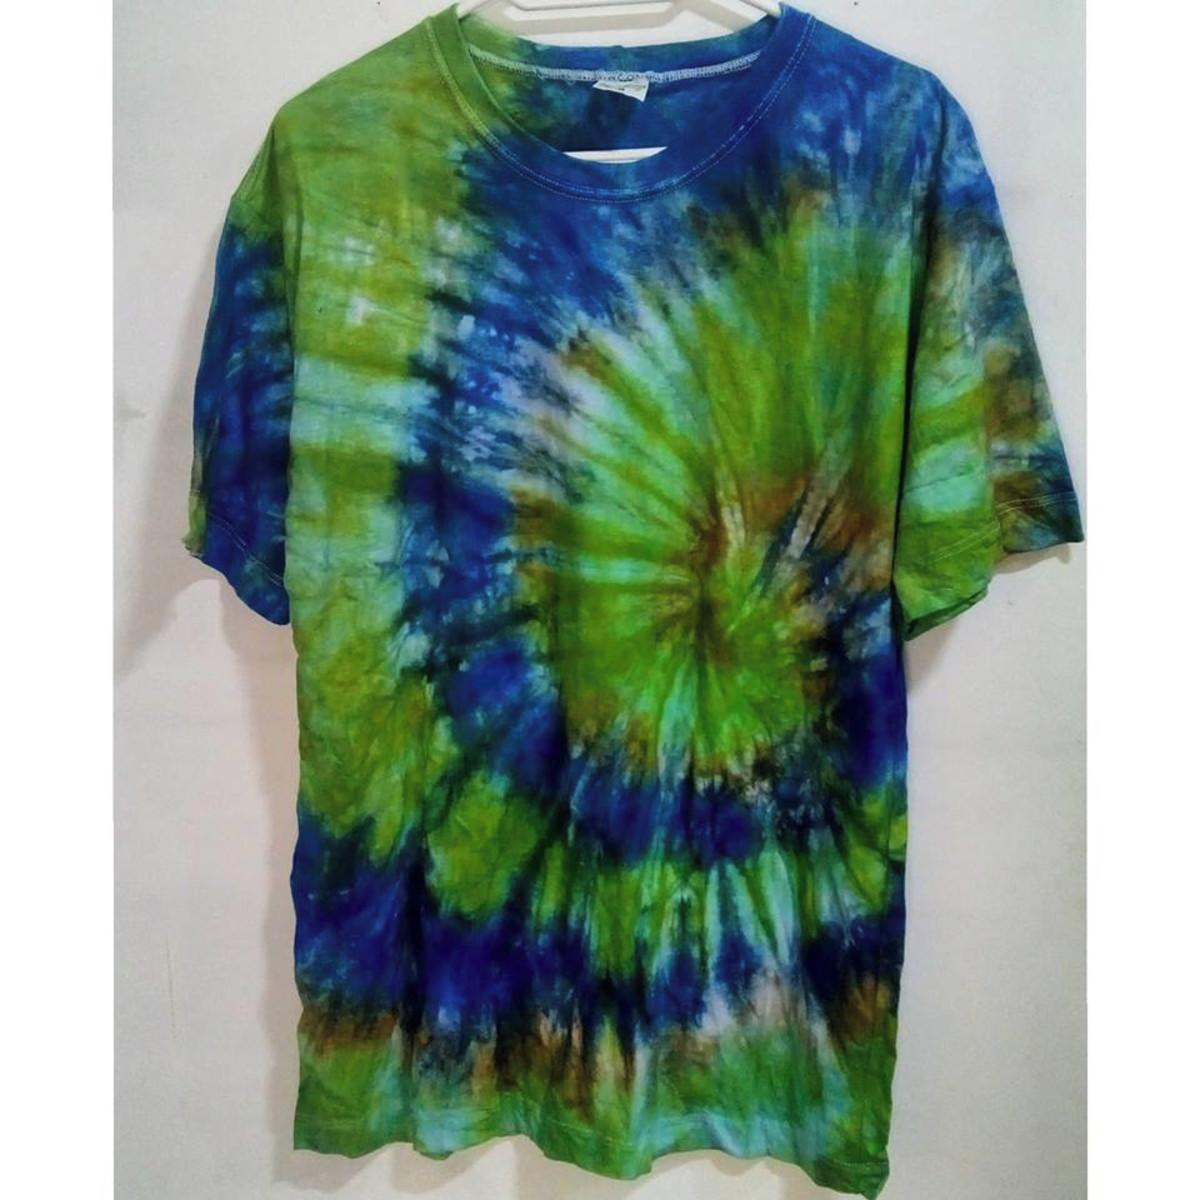 Camiseta tie dye espiral unissex no Elo7  7d30237f3df